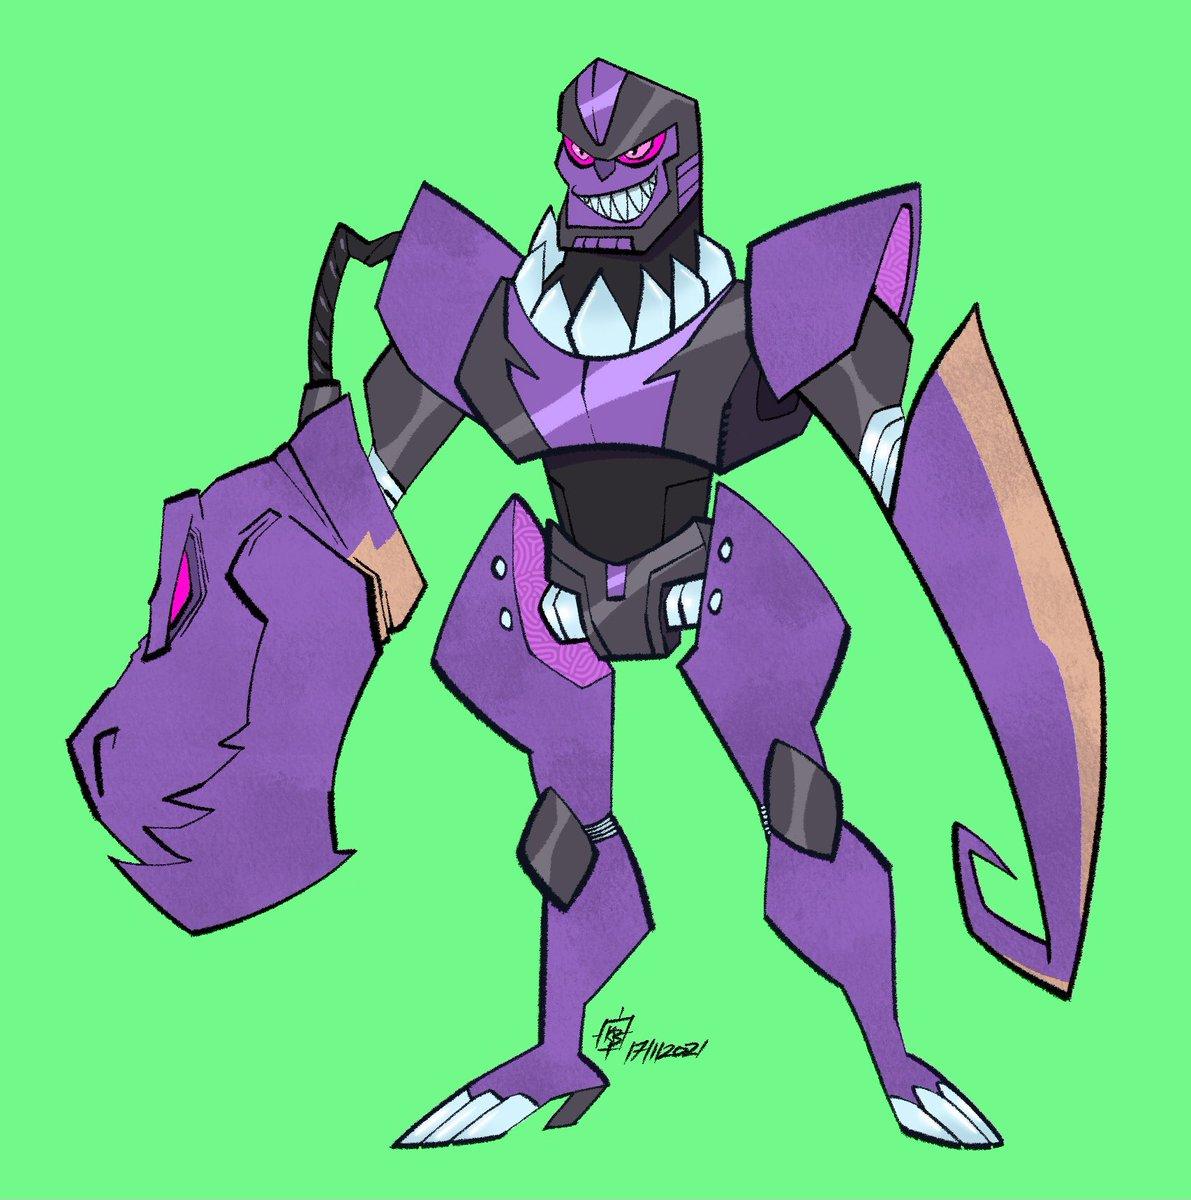 Megatron #BeastWars #megatron #Transformers #transformerswfc